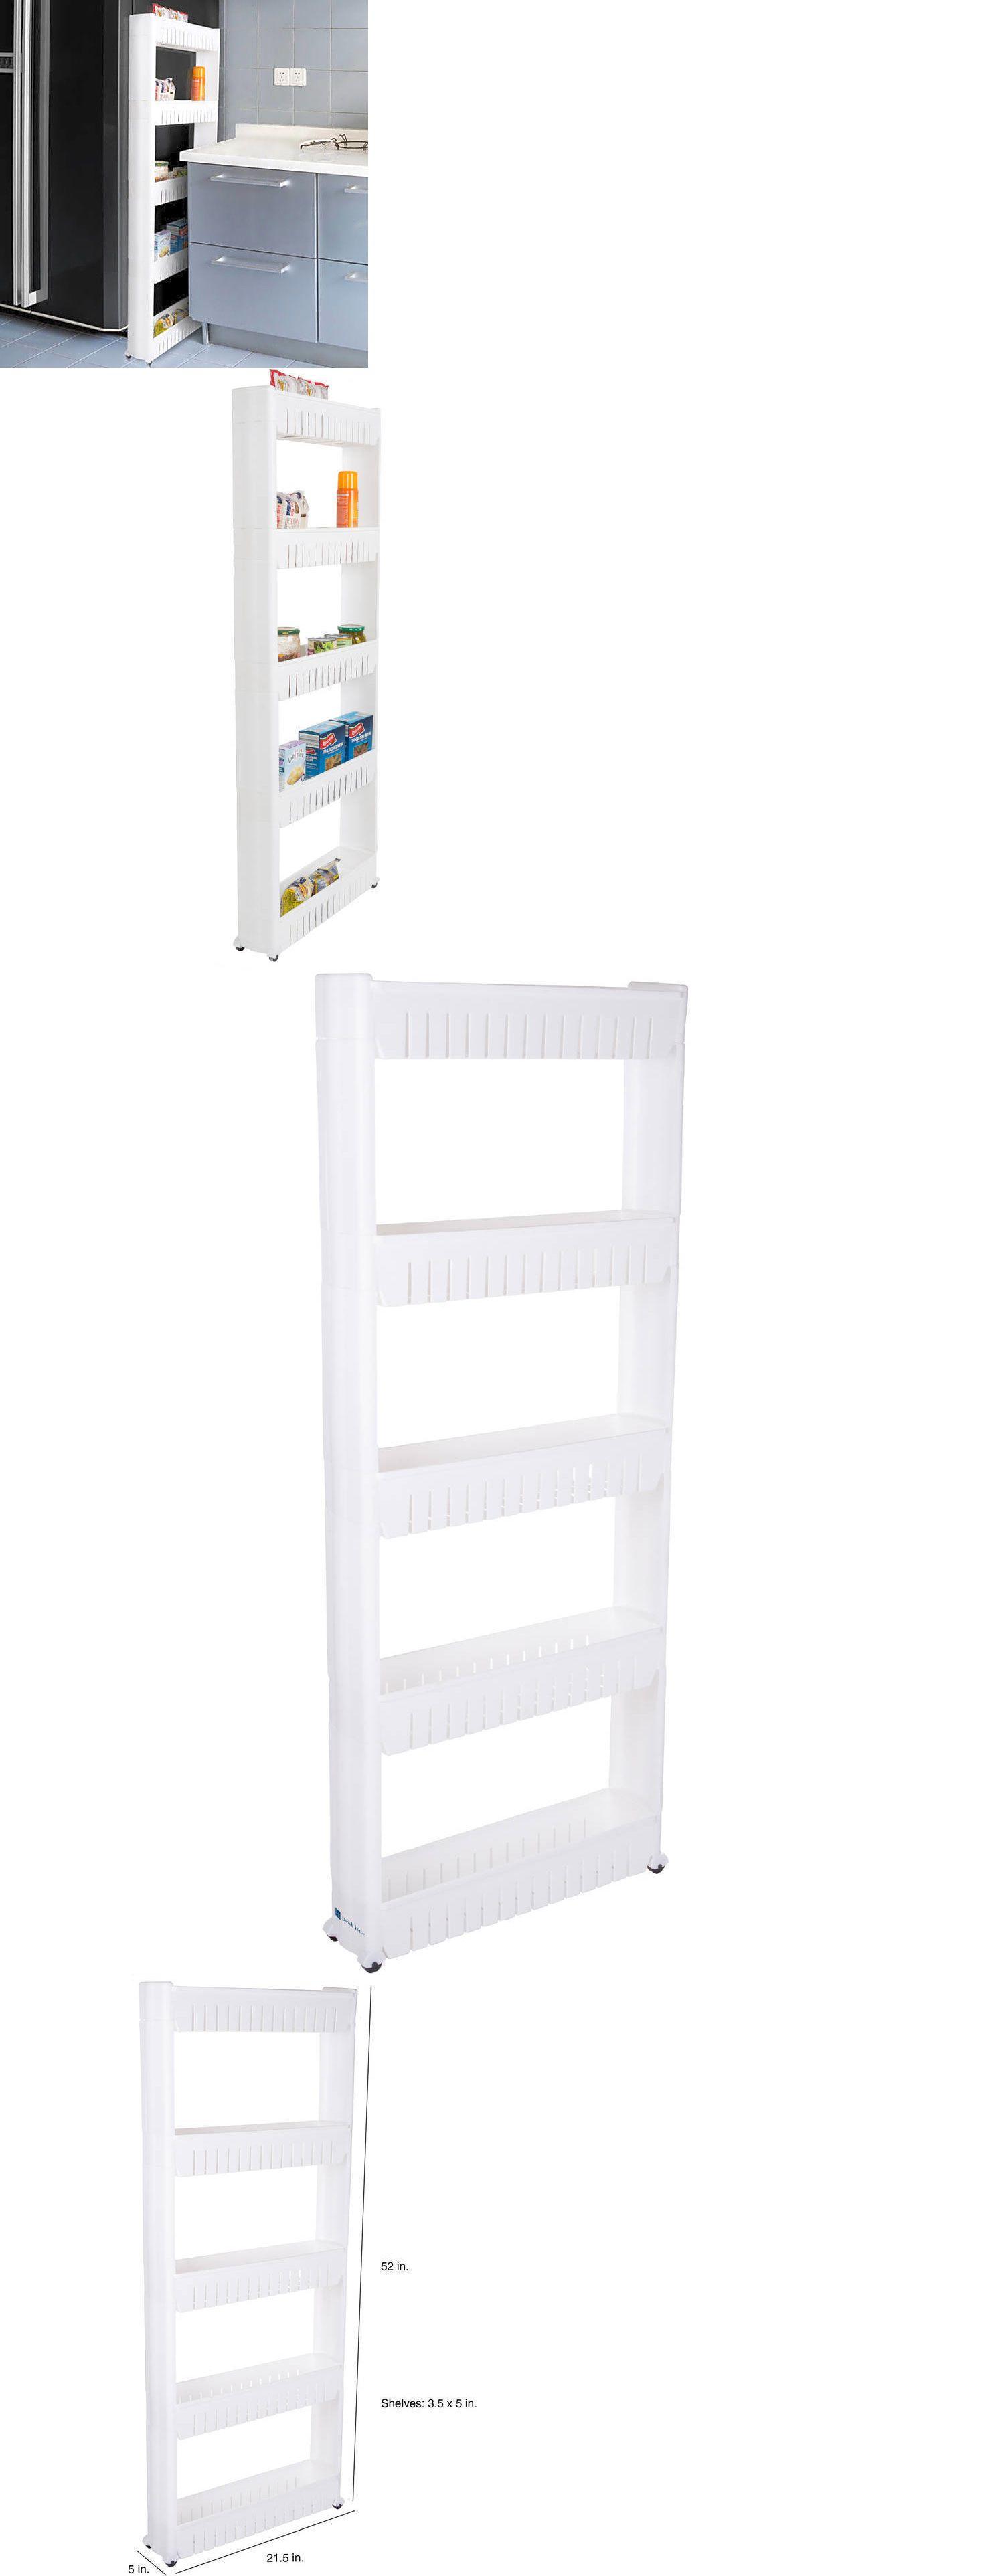 Racks and Holders 46283: 5 Shelves Storage Organizer Rack Home ...